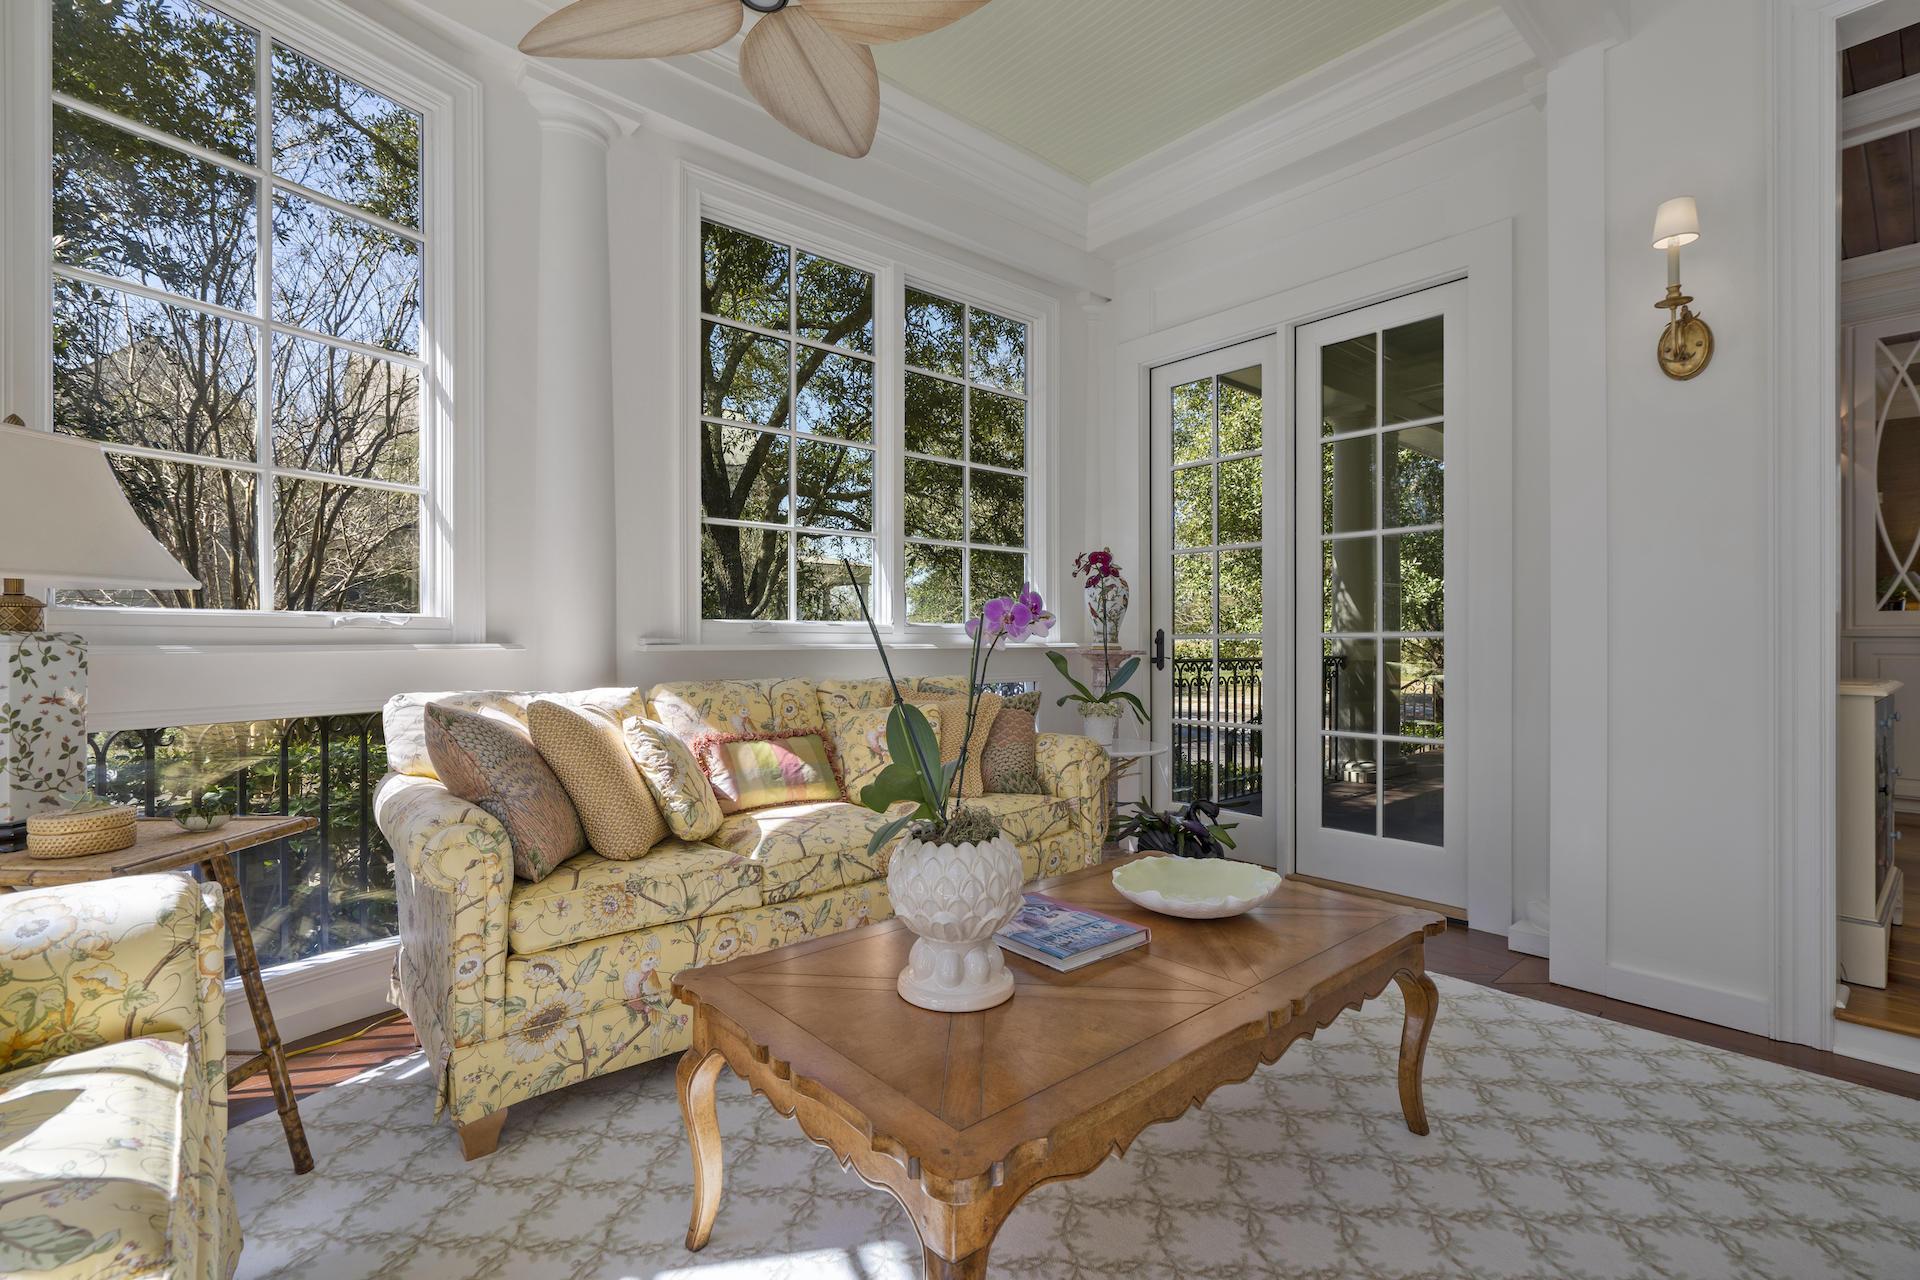 Daniel Island Homes For Sale - 623 Island Park, Charleston, SC - 46